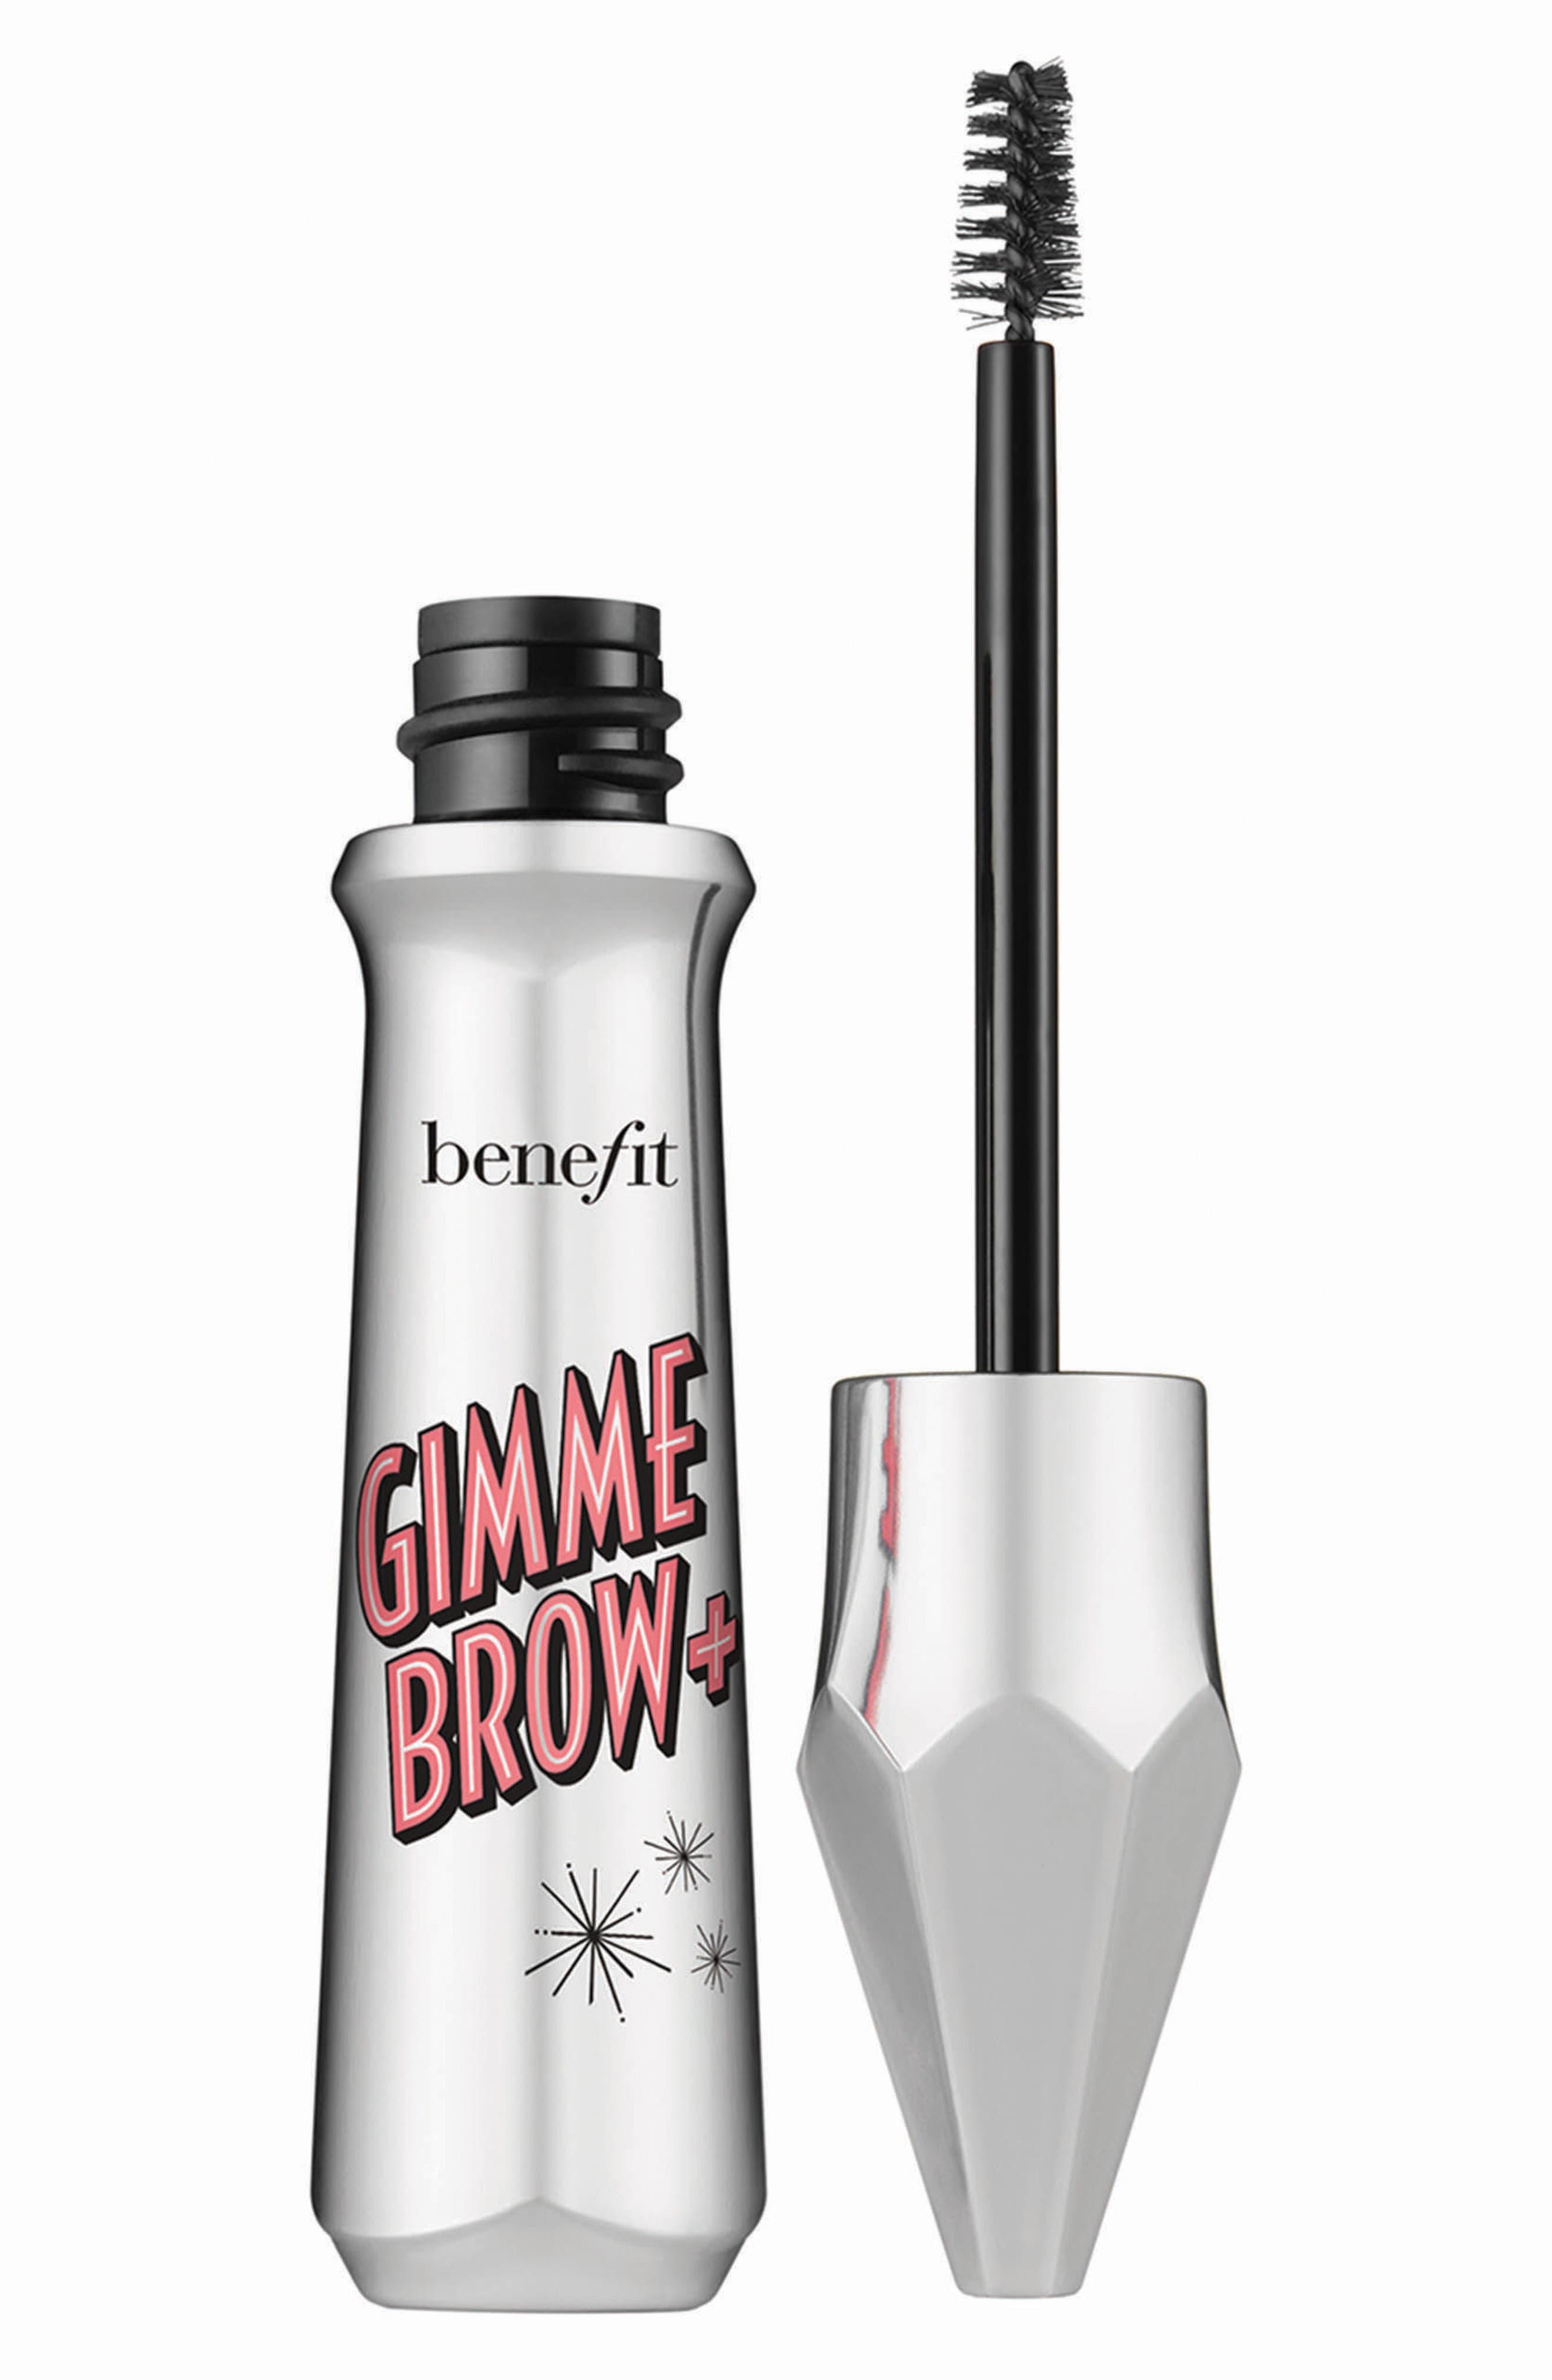 Benefit Gimme Brow+ Volumizing Eyebrow Gel,                         Main,                         color, 01 LIGHT/COOL LIGHT BLONDE